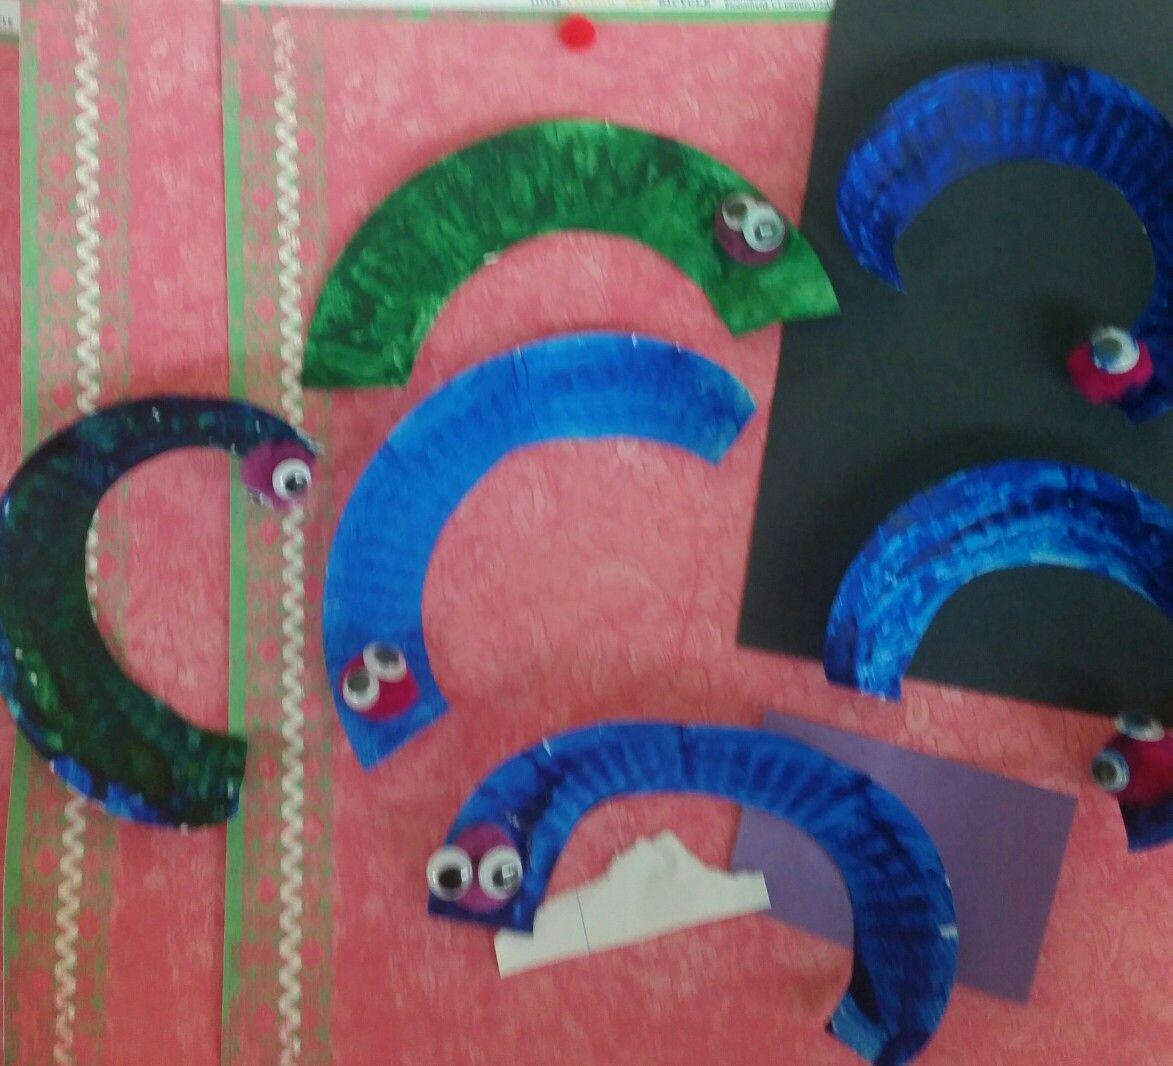 Pin by Danielle on Preschool crafts. Preschool crafts